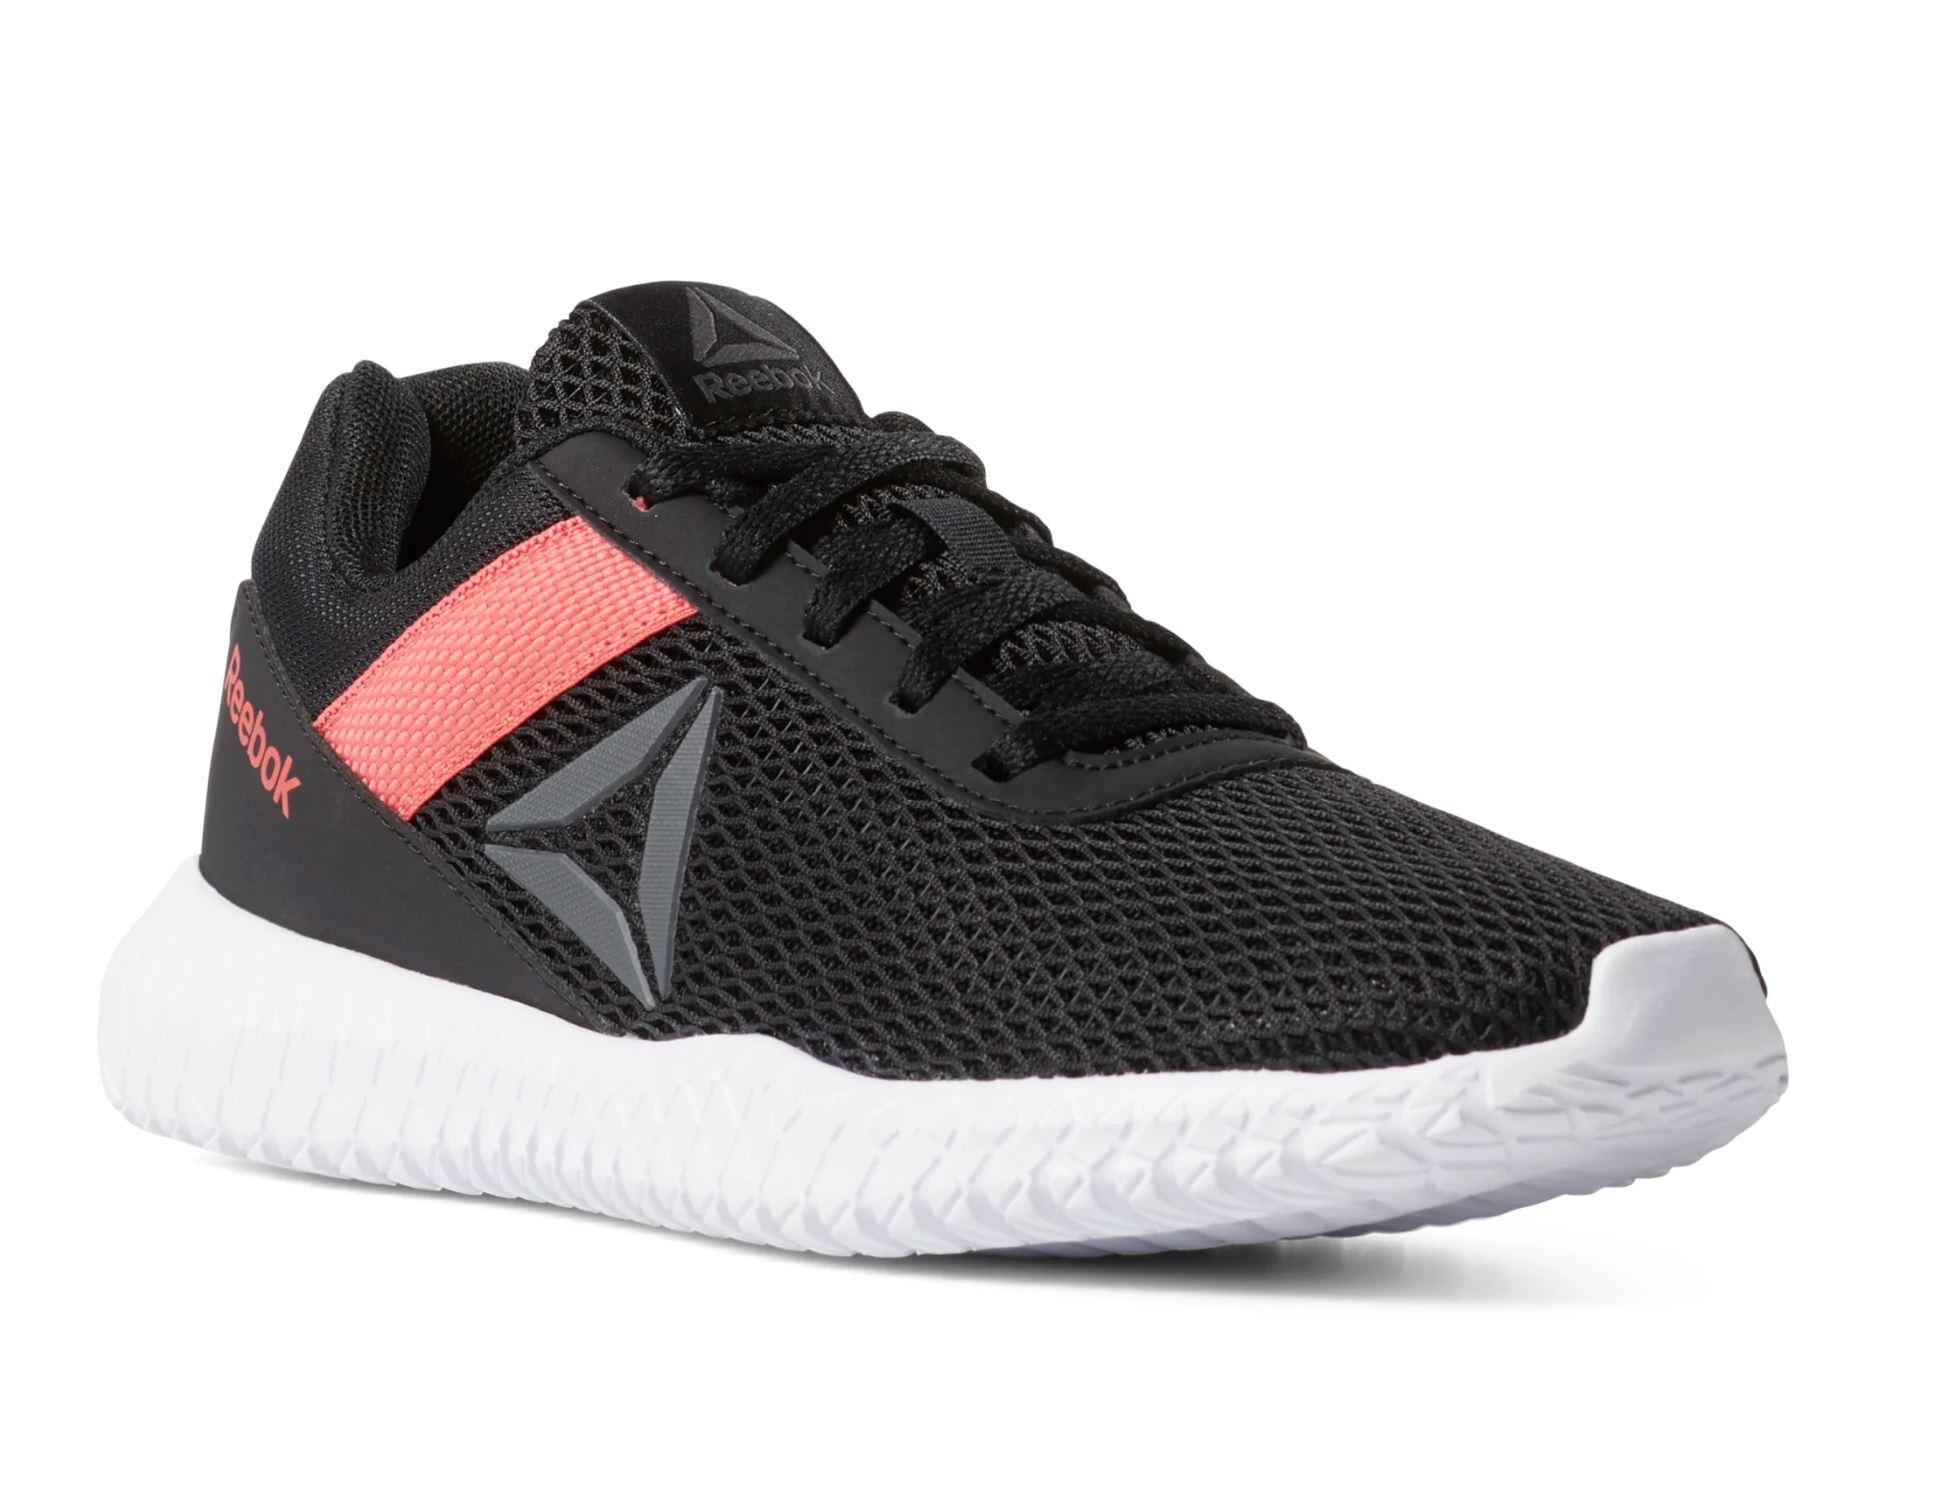 Reebok FLEXAGON ENERGY TR, ženske tenisice za fitnes, crna